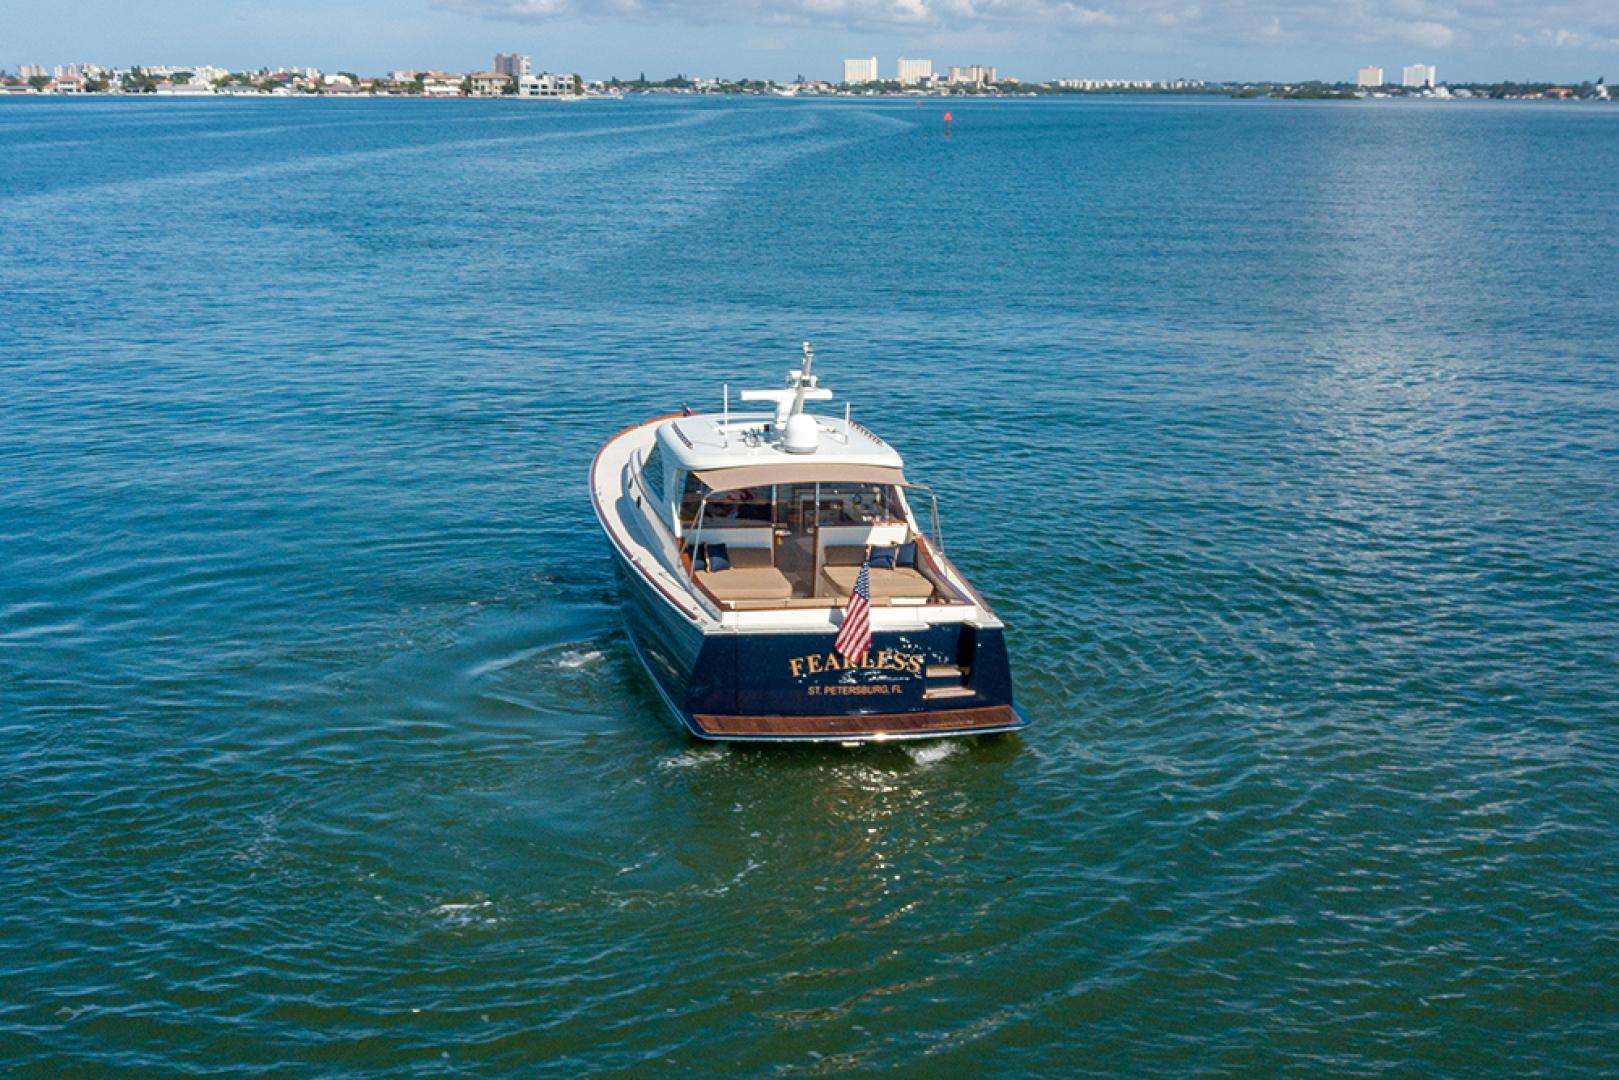 San Juan-SJ48 Express 2006 FEARLESS Saint Petersburg-Florida-United States-Stern profile-1508117 | Thumbnail